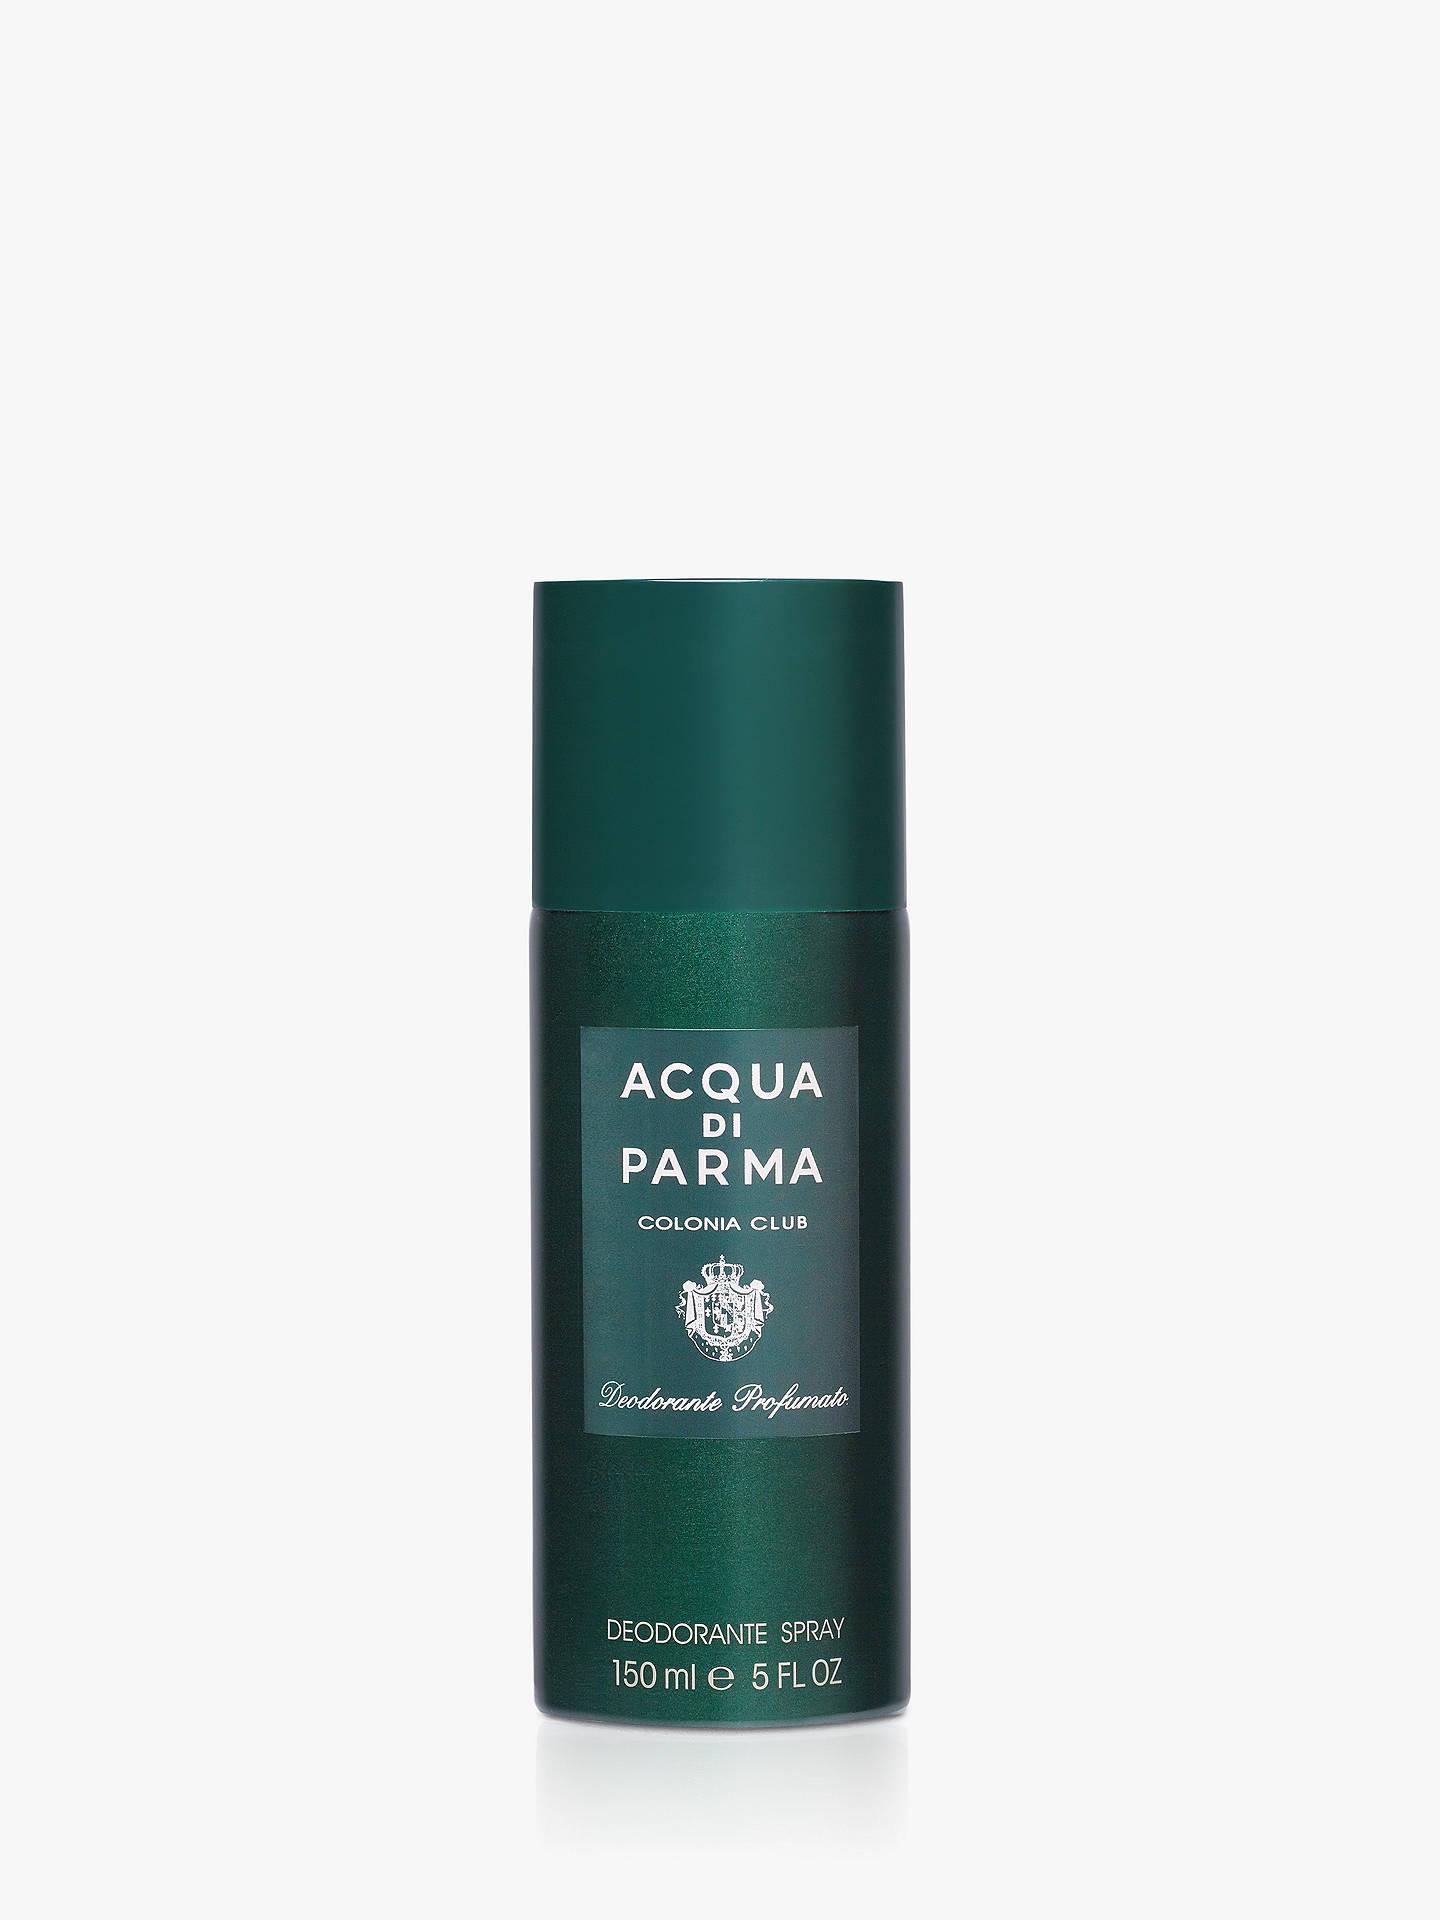 Acqua Di Parma Colonia Club Deodorant Spray